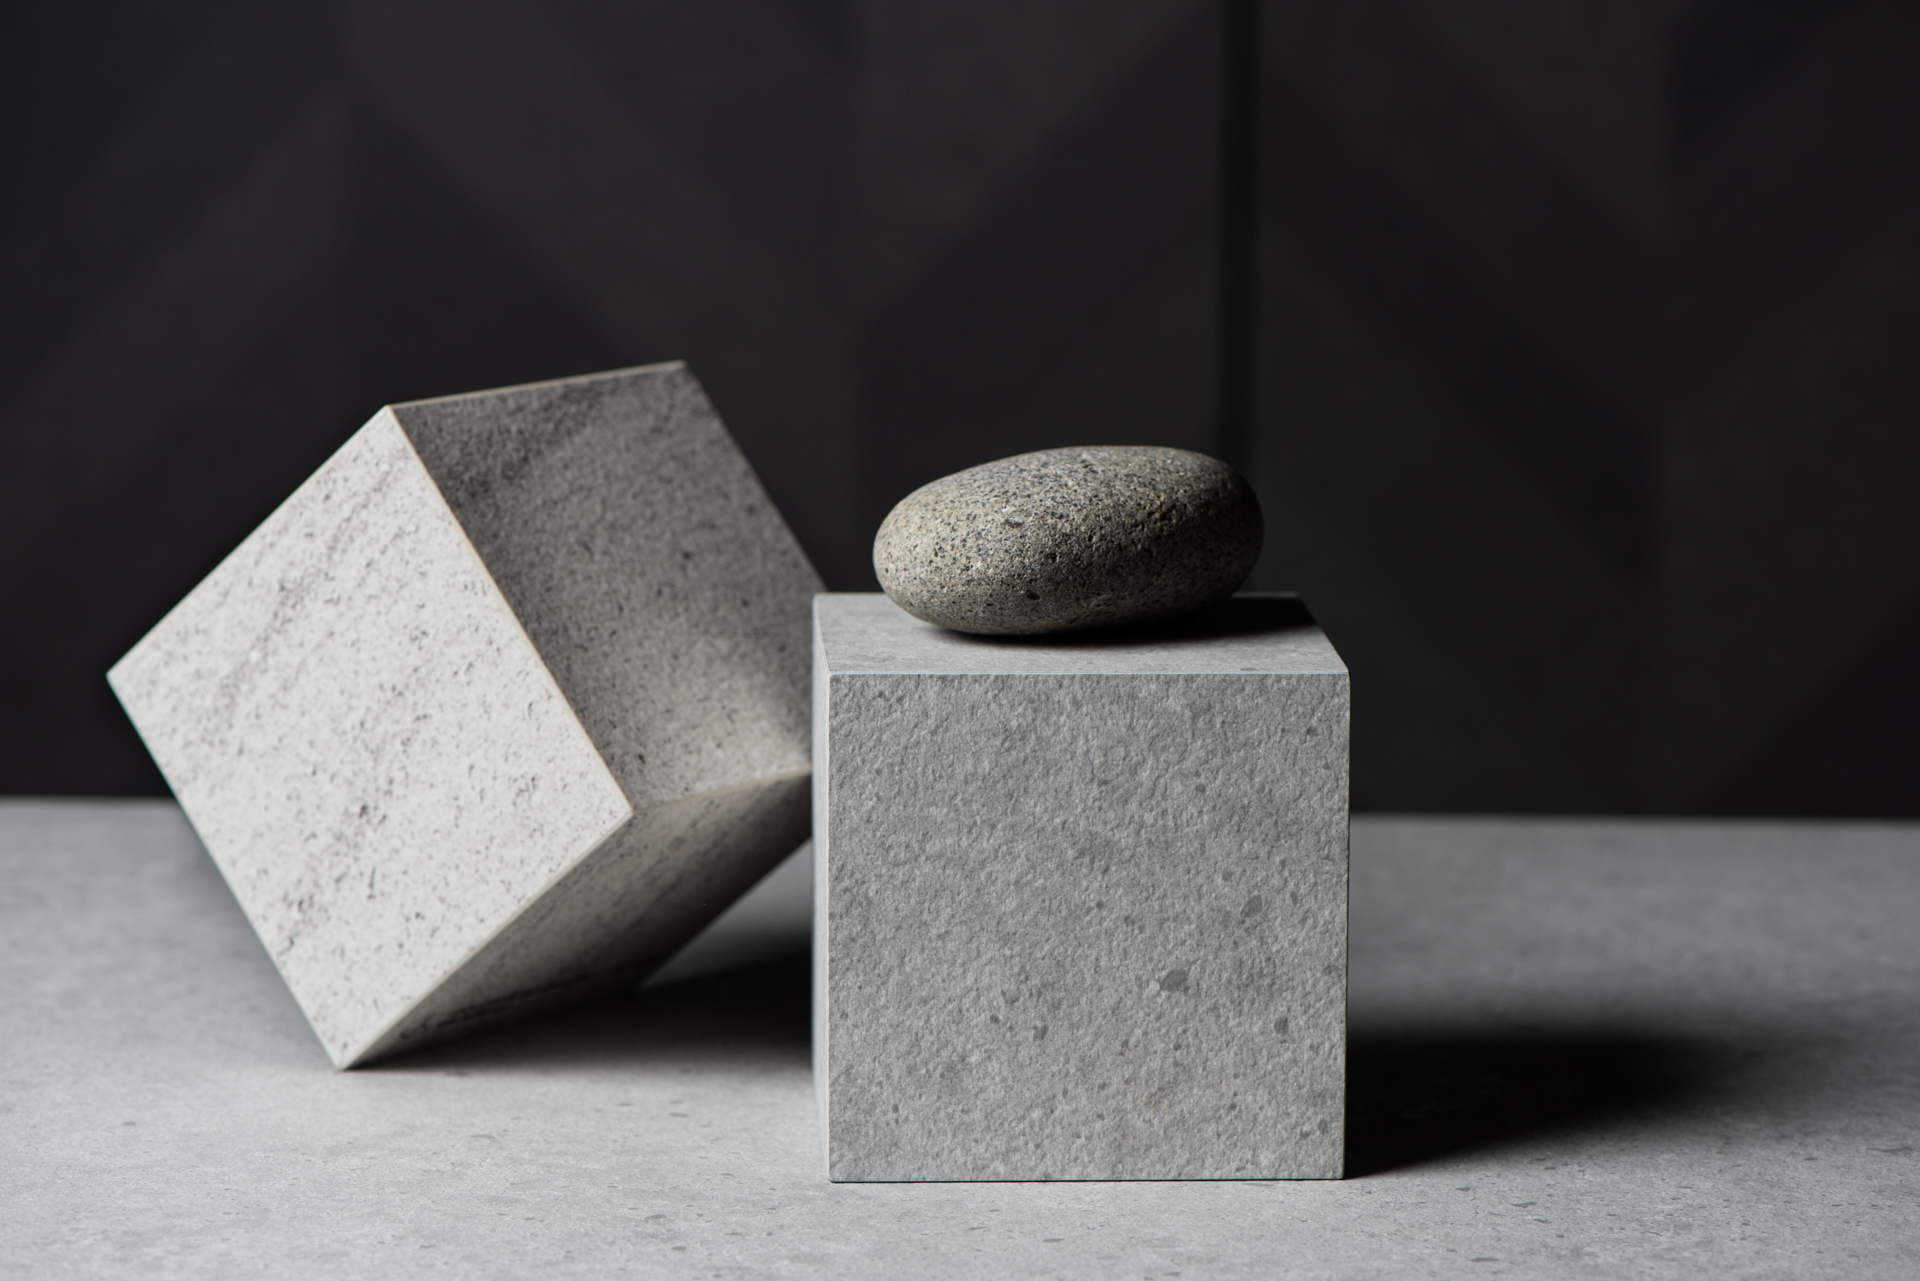 squarerooms lamitak new laminates exclusive collection solid core grey